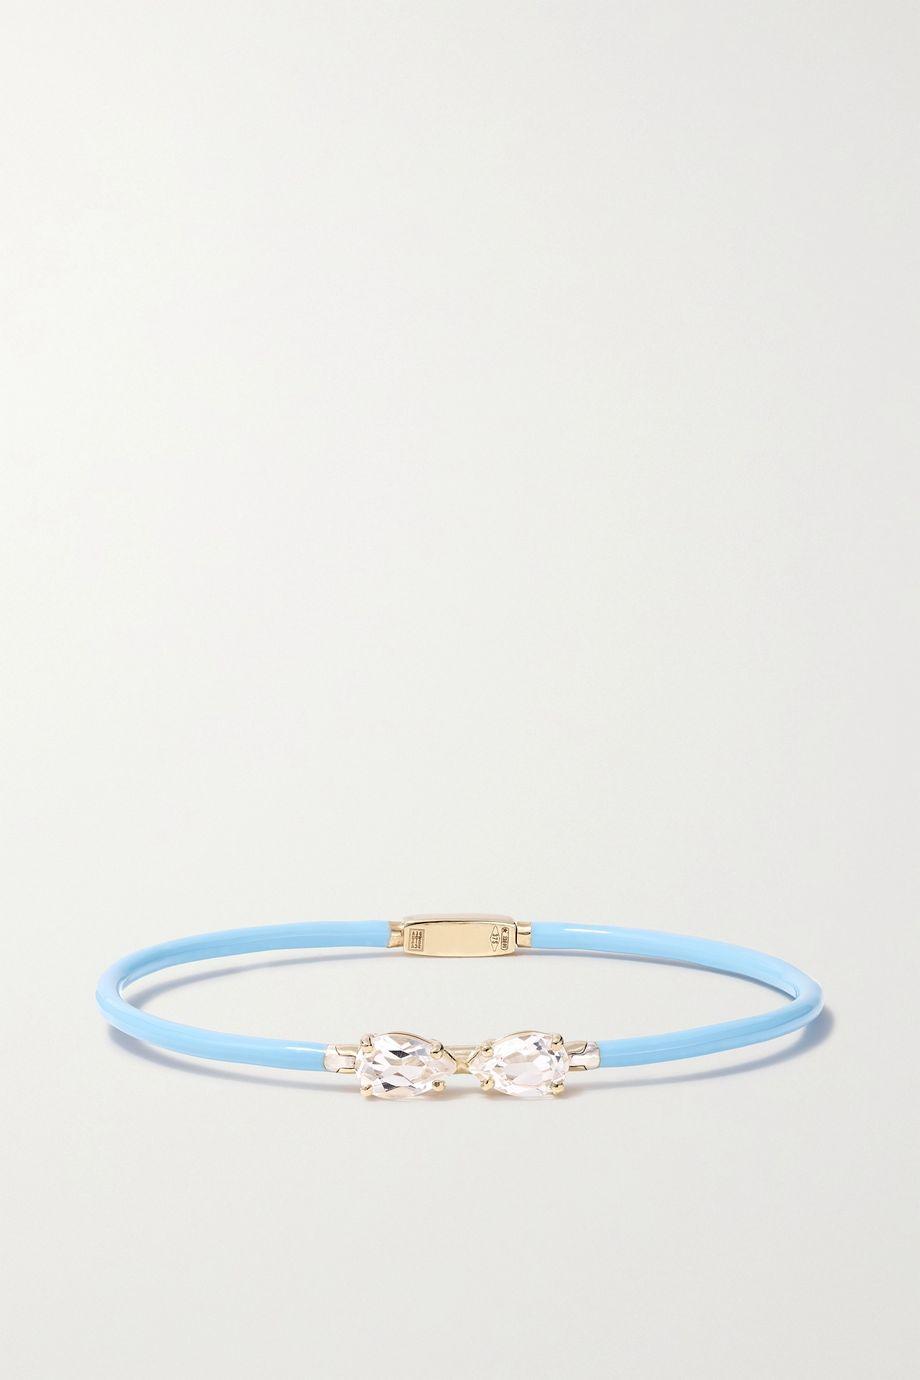 Bea Bongiasca Vine 9-karat gold, enamel and rock crystal bracelet